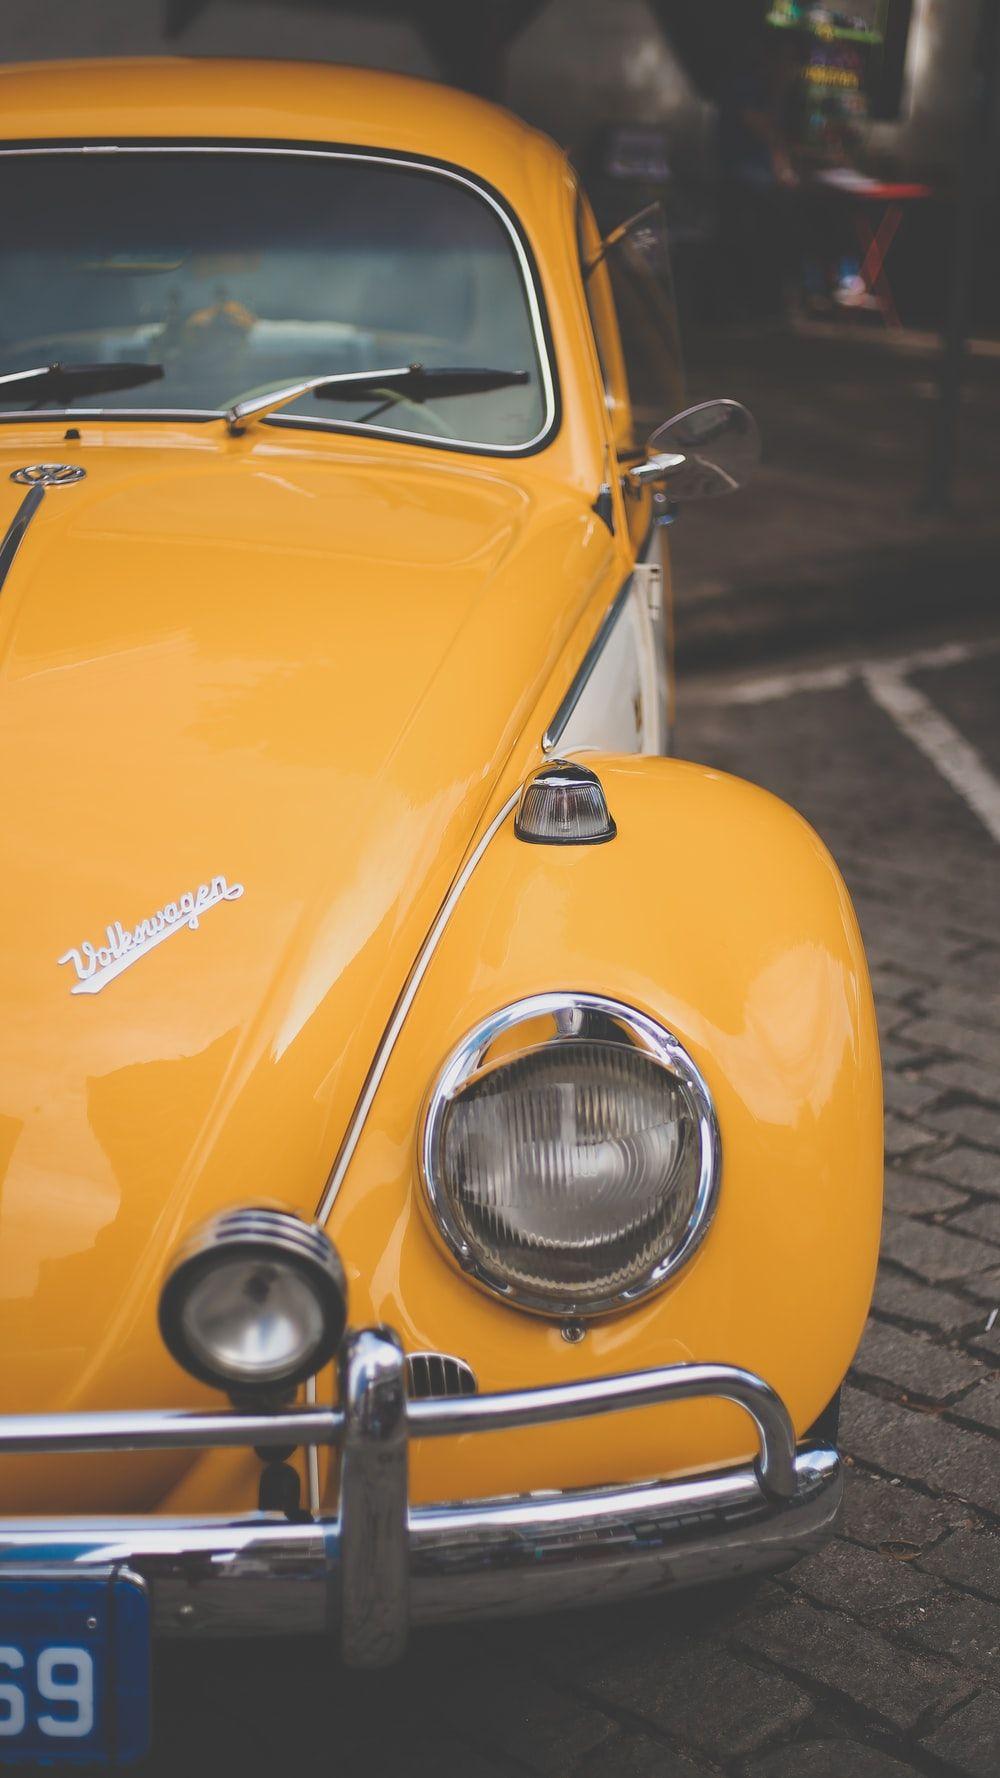 Photo taken by Tadeu Jnr VW Beetle Käfer Fusca Car